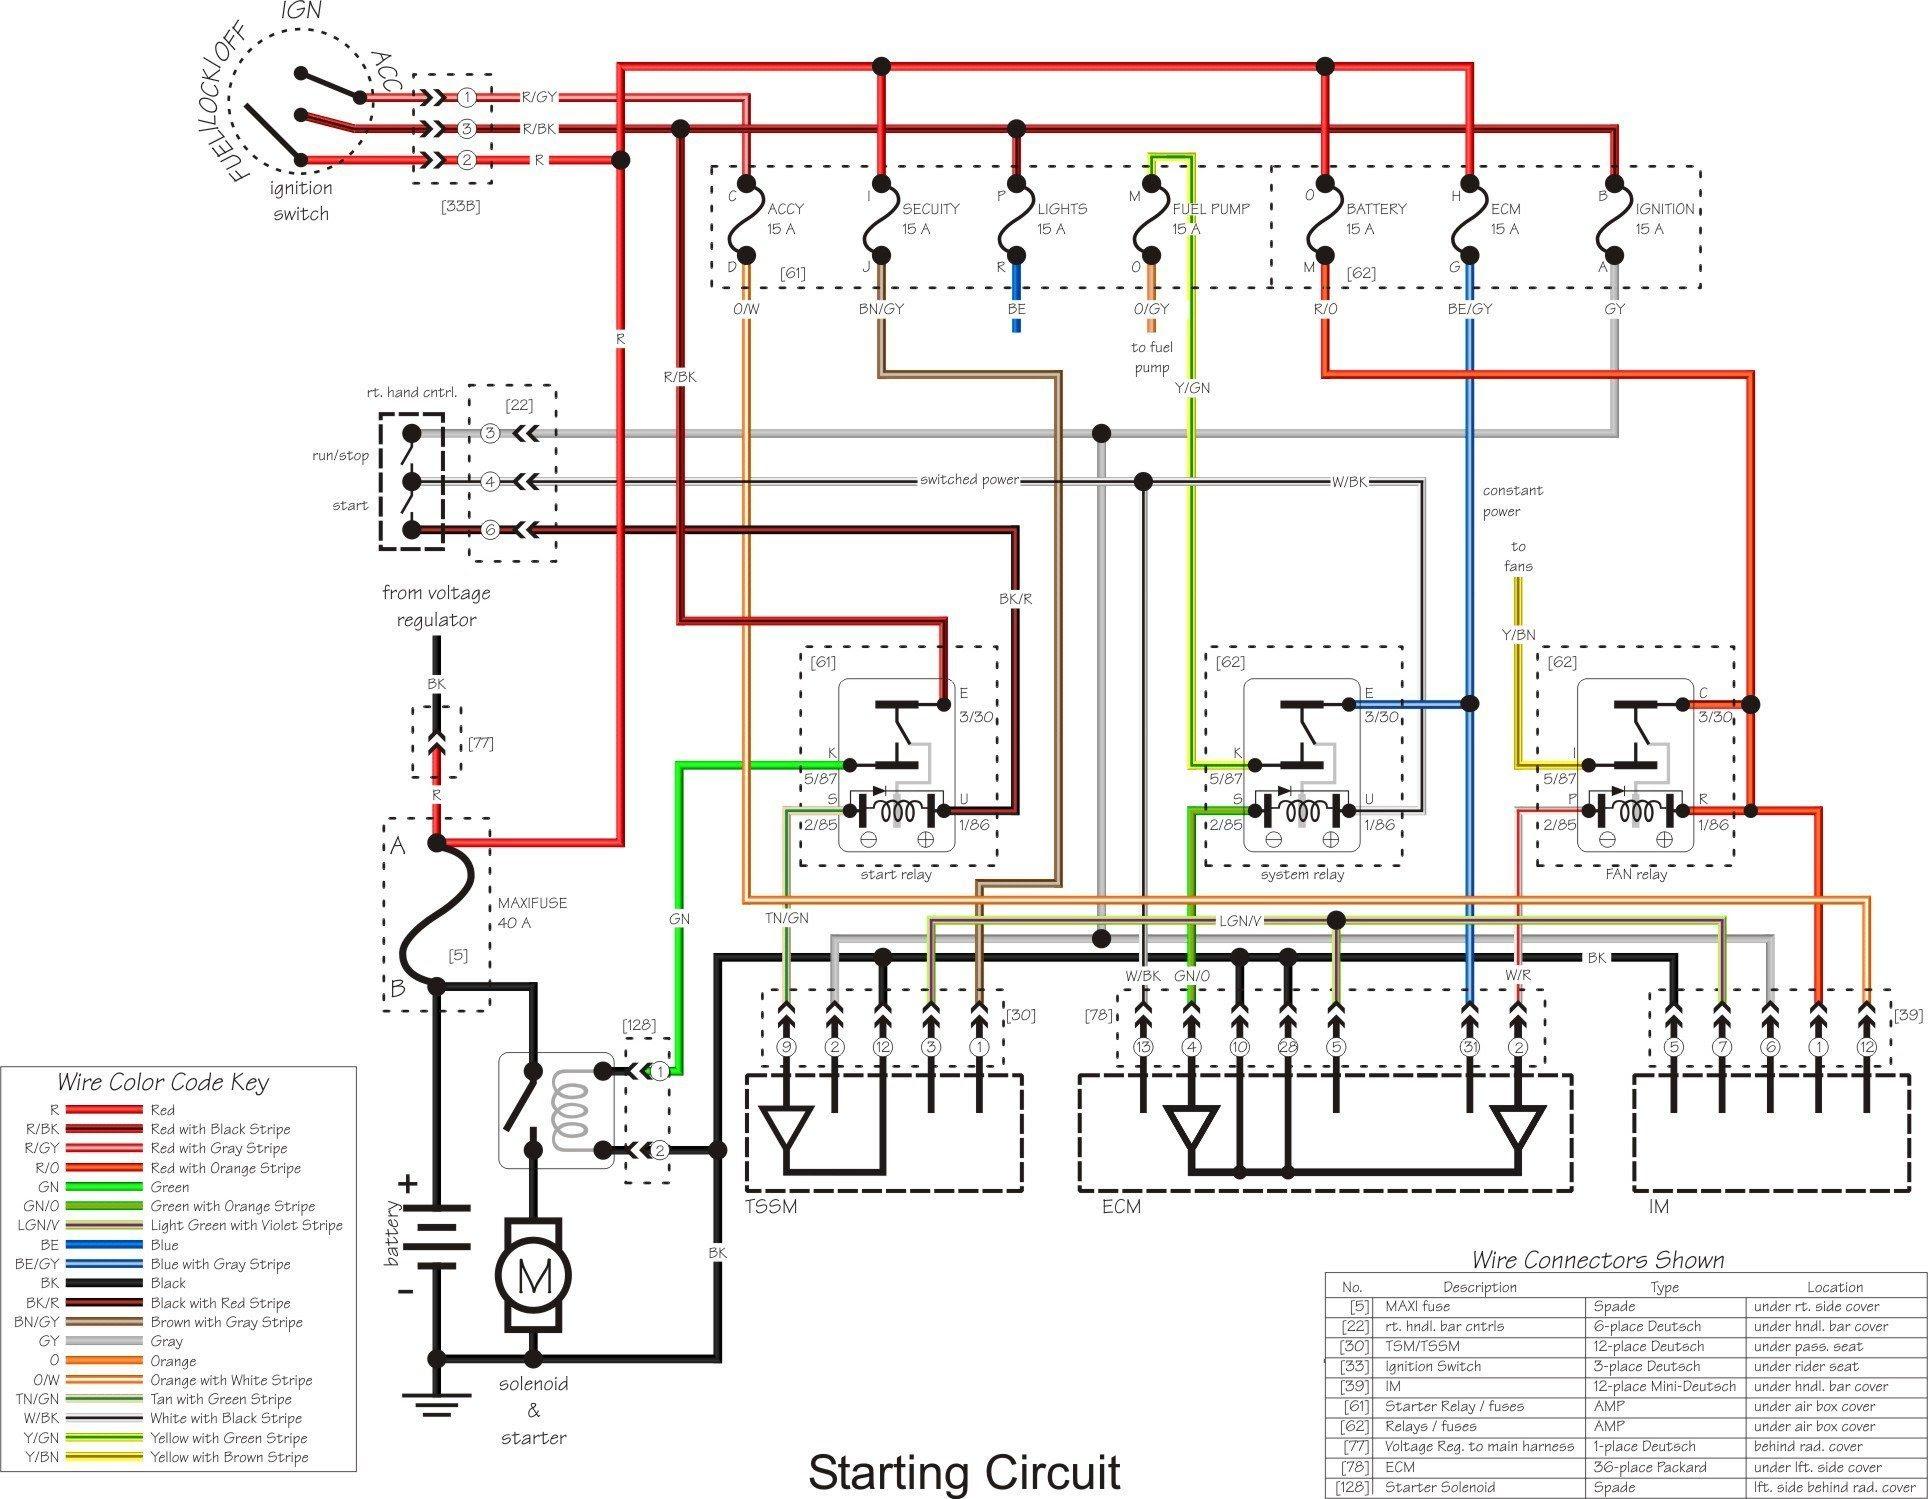 Harley Davidson Headlight Wiring Diagram